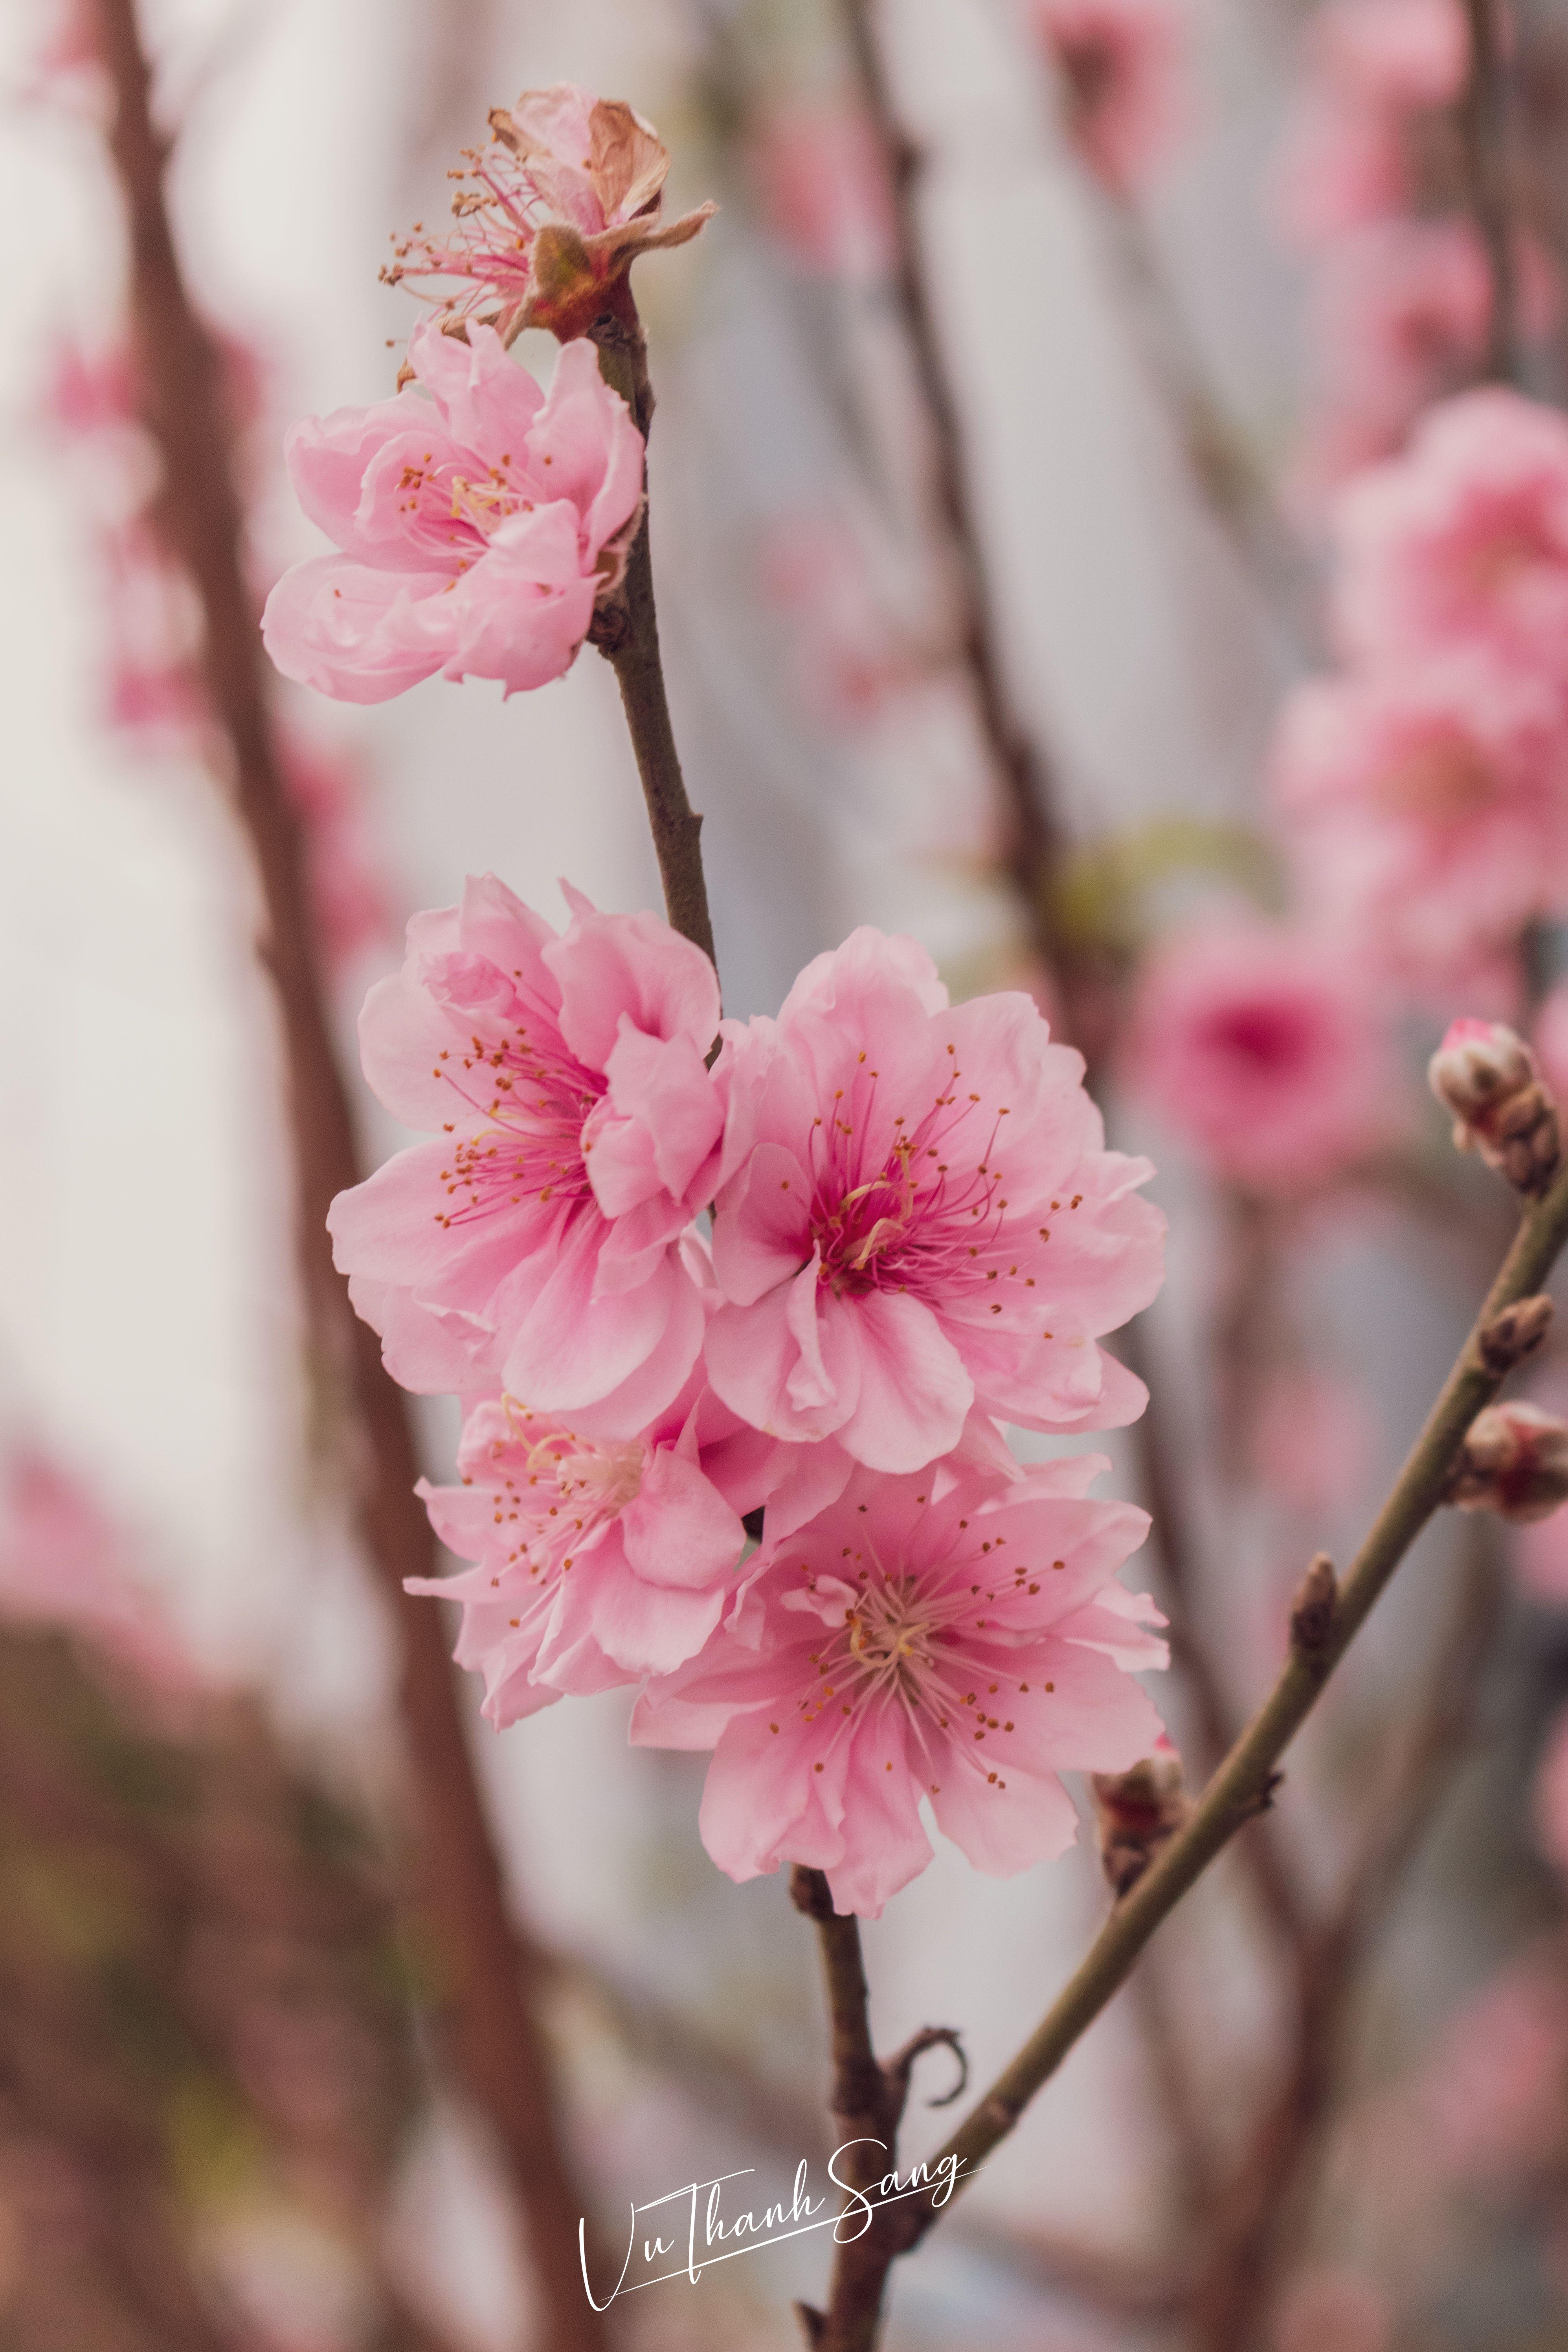 Peach Blossom Peach Blossom Flower Peach Blossom Tree Peach Blossoms